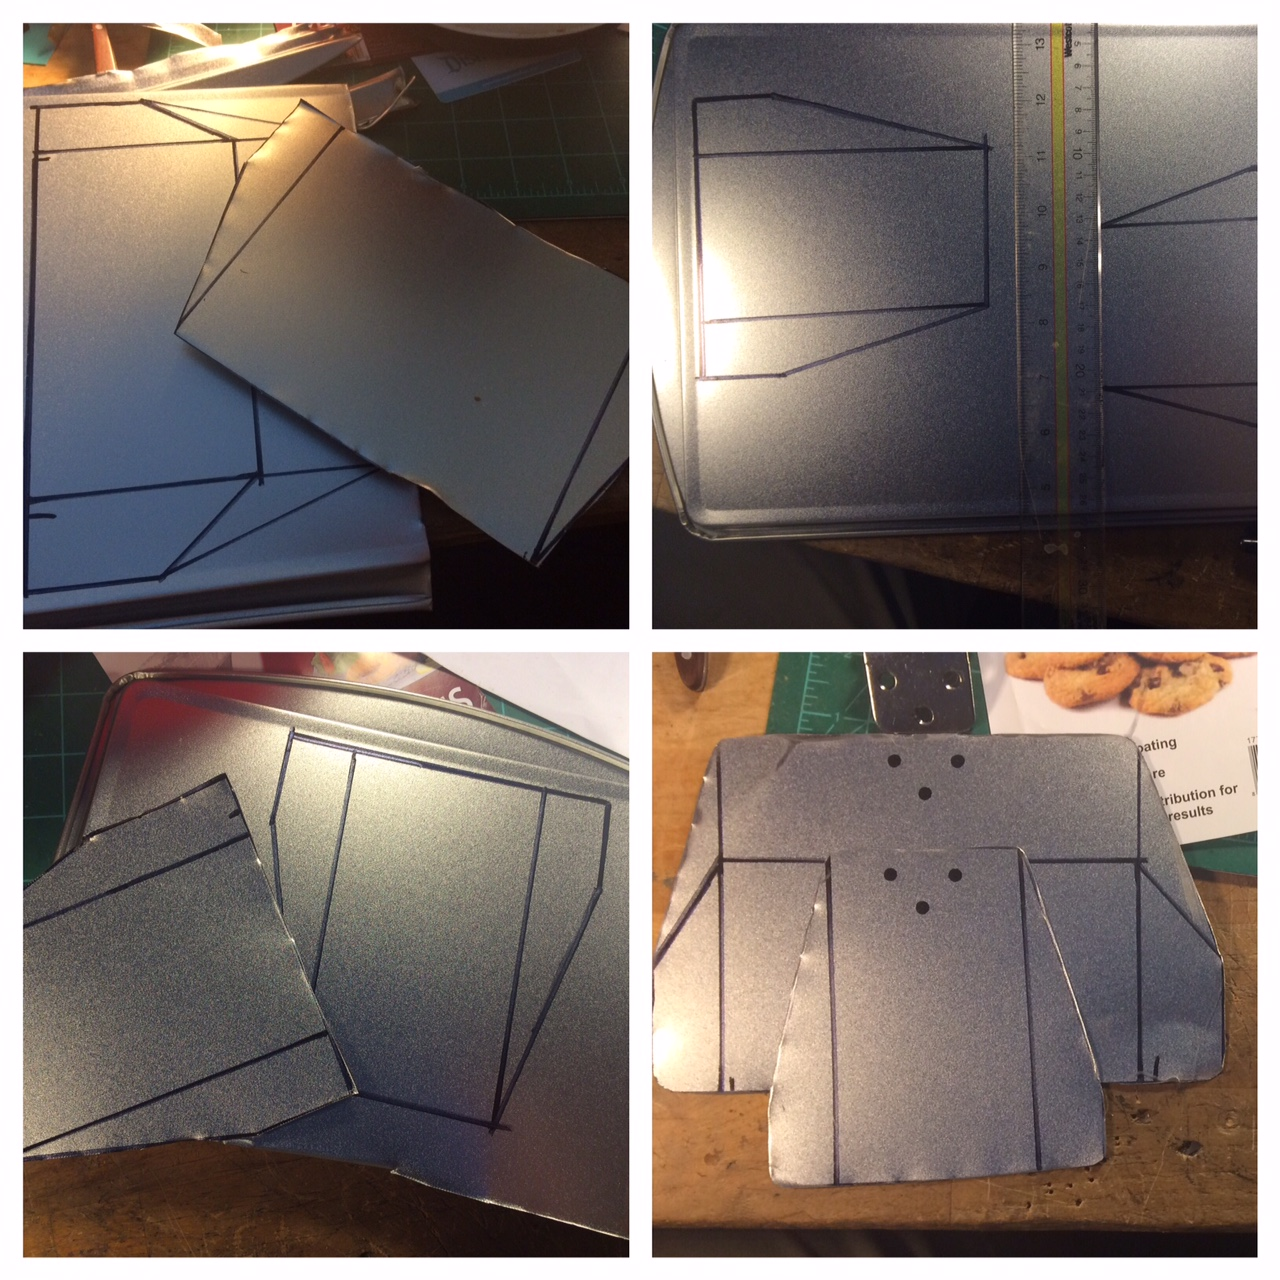 Lighting 101 How To Make Diy Barn Doors For Work Lights Part 2